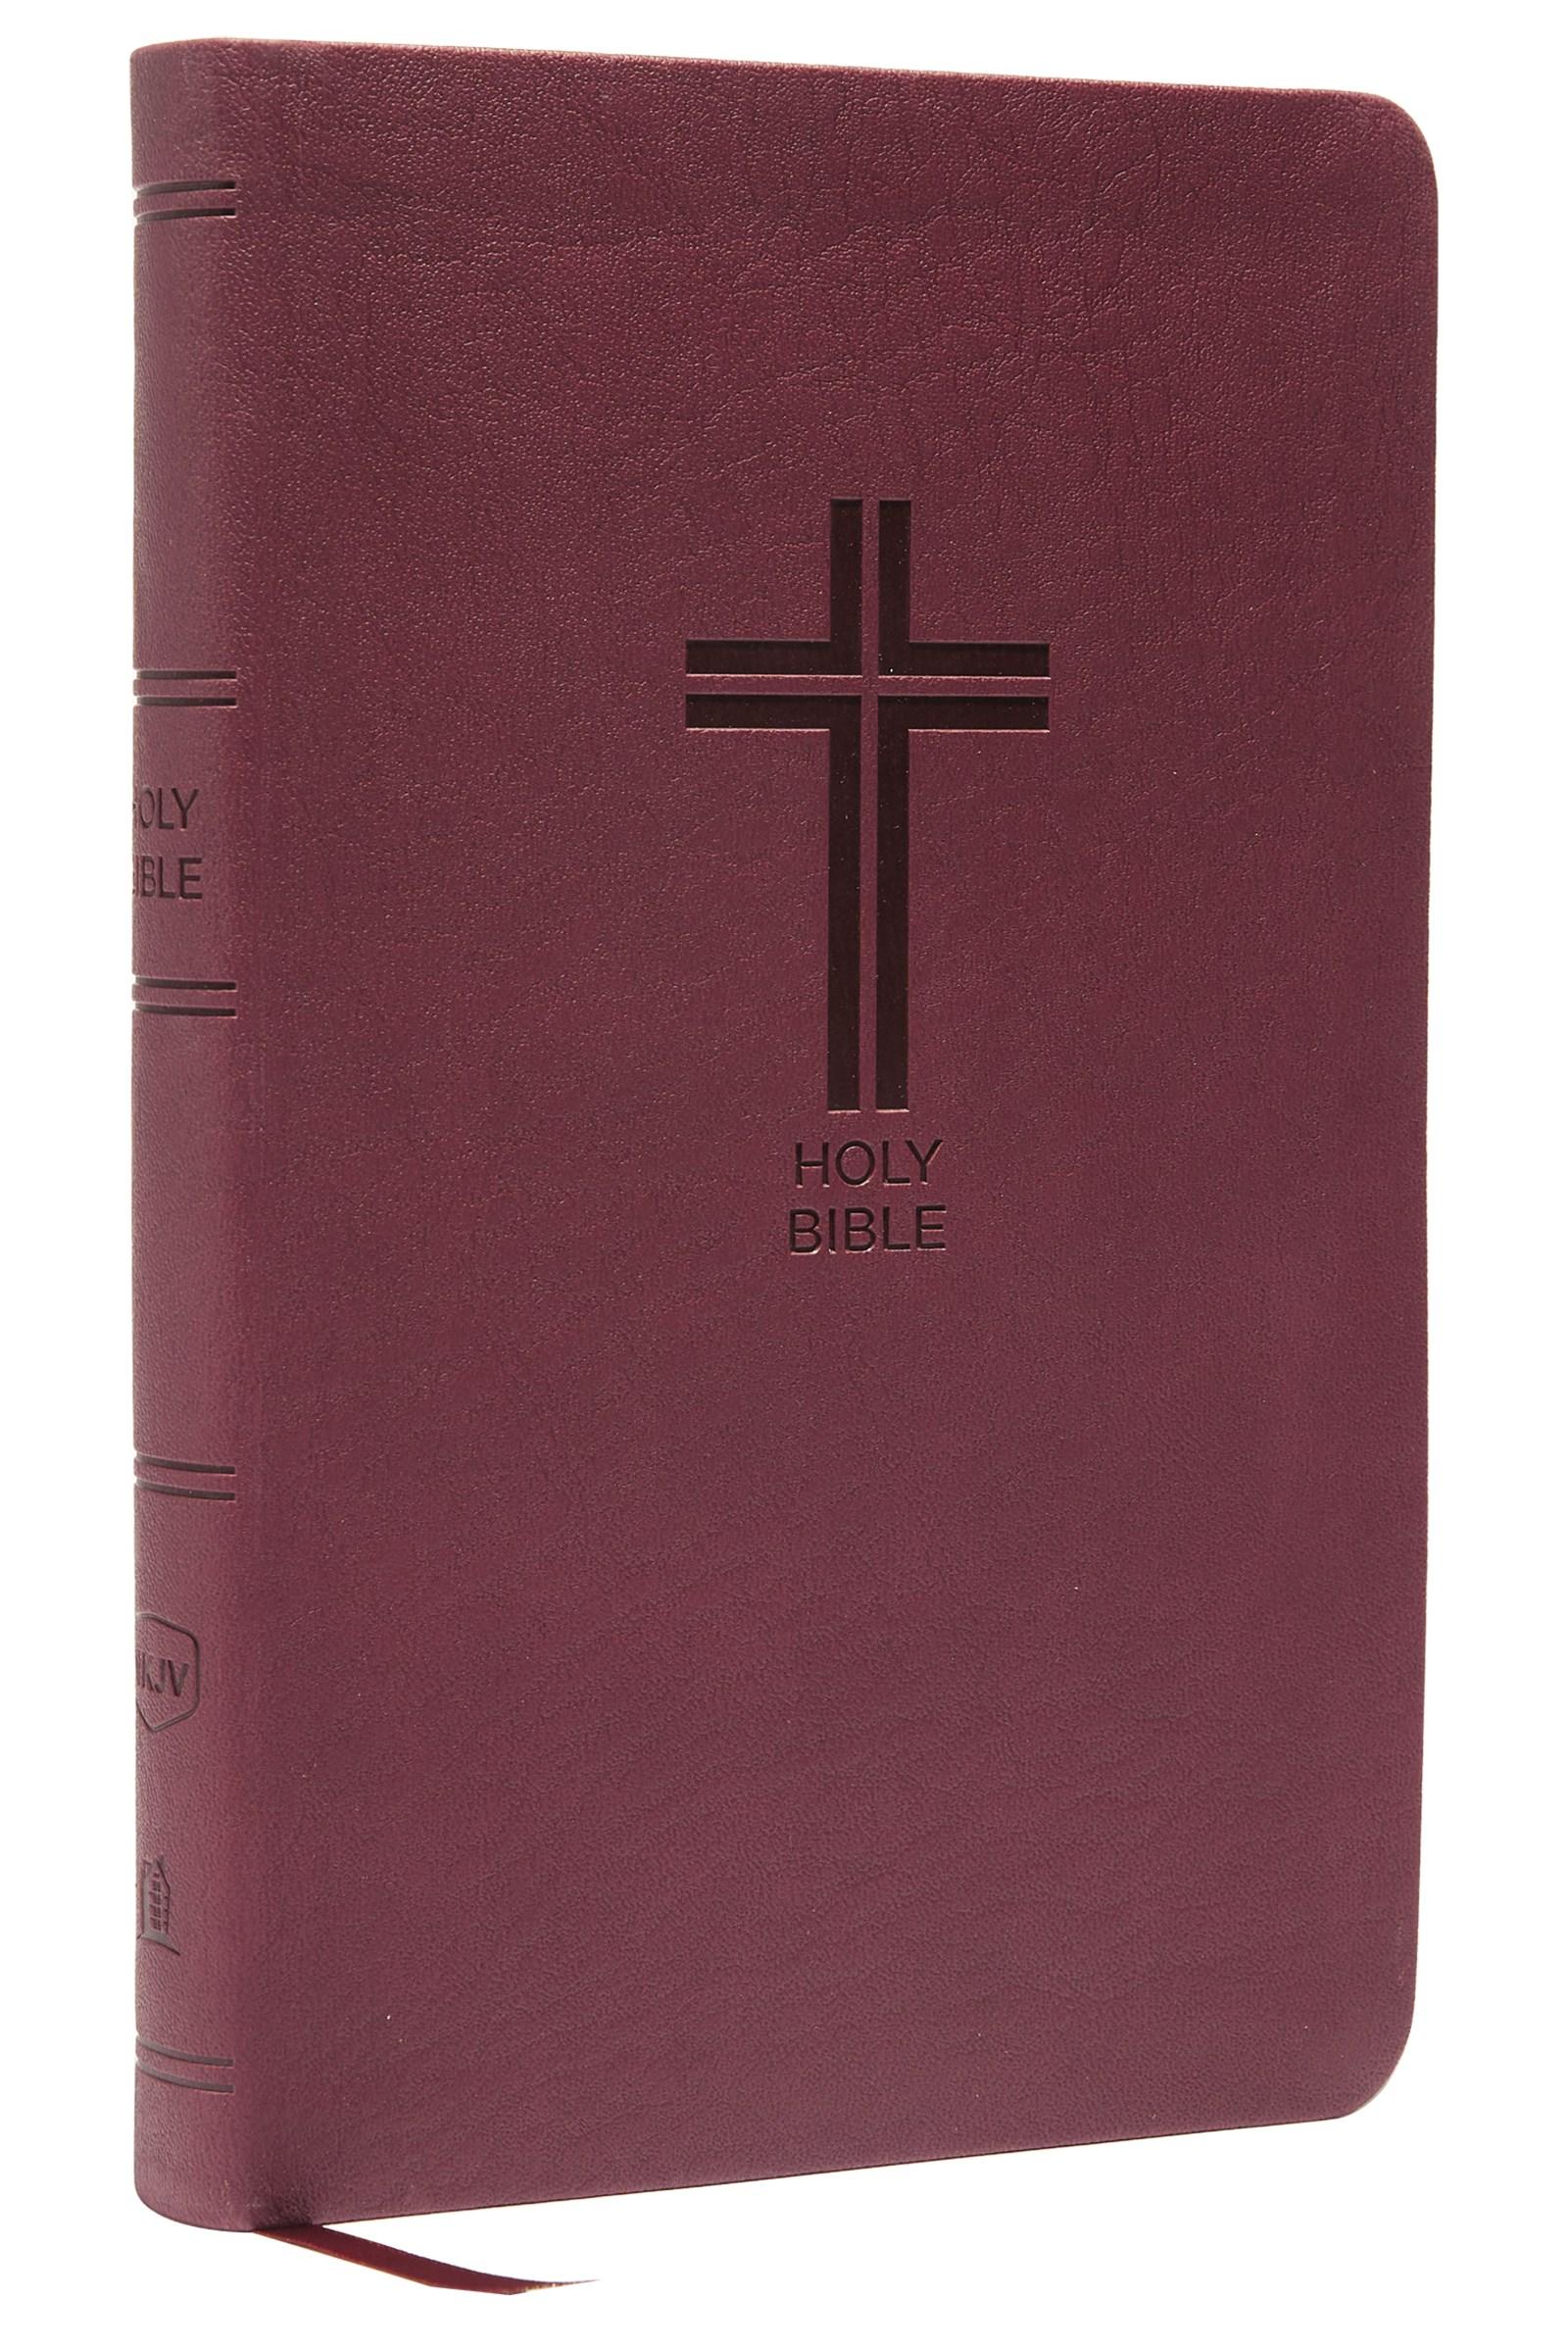 NKJV Thinline Bible (Comfort Print)-Burgundy Leathersoft